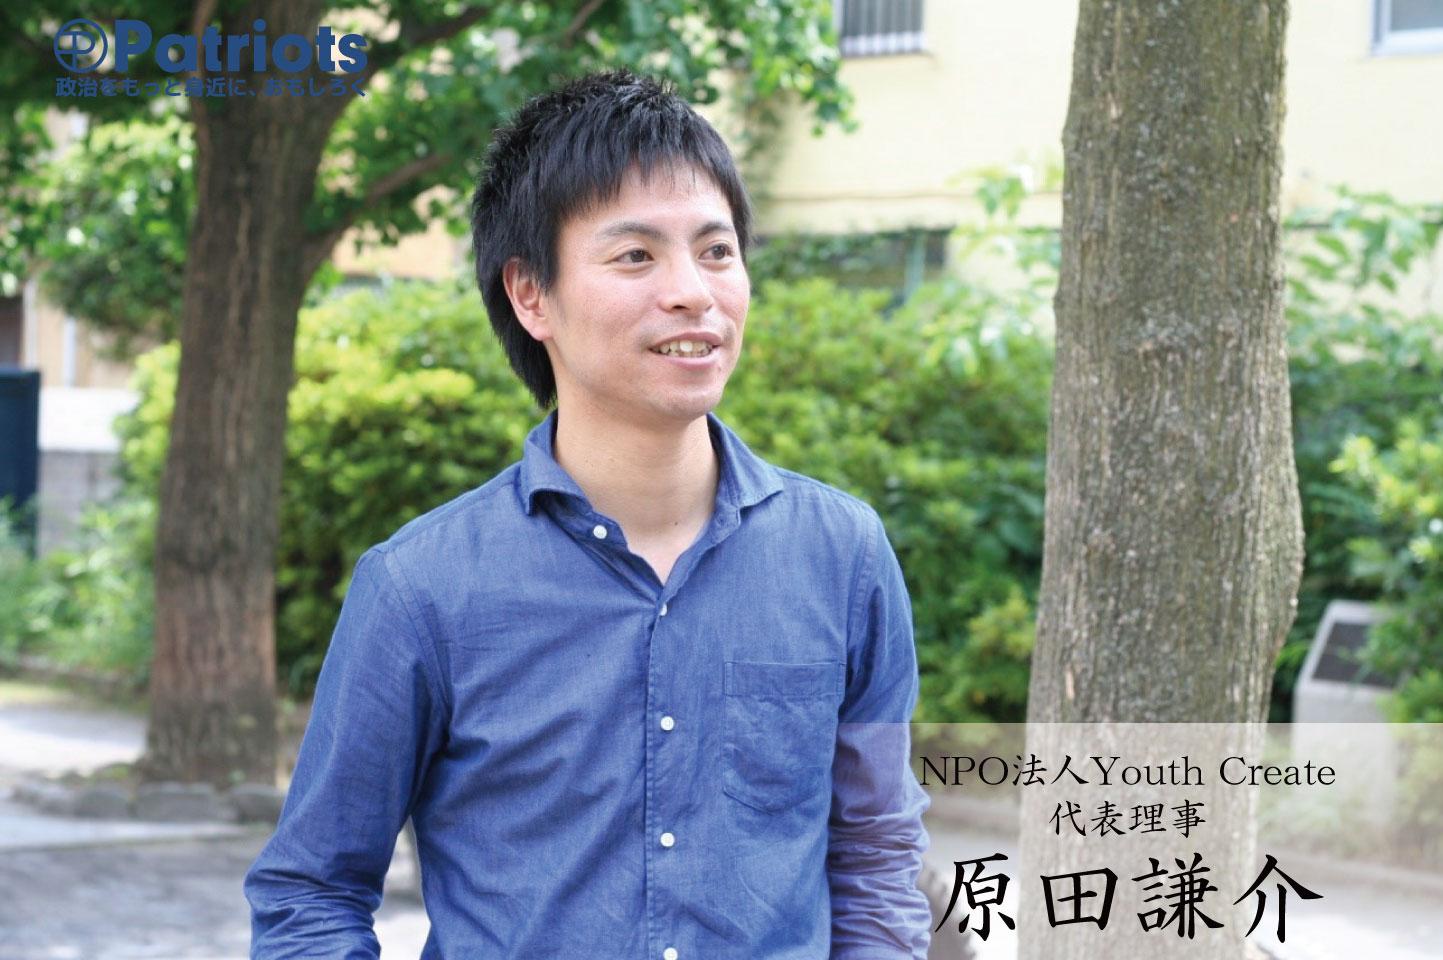 NPO法人Youth Create代表理事 原田謙介さん